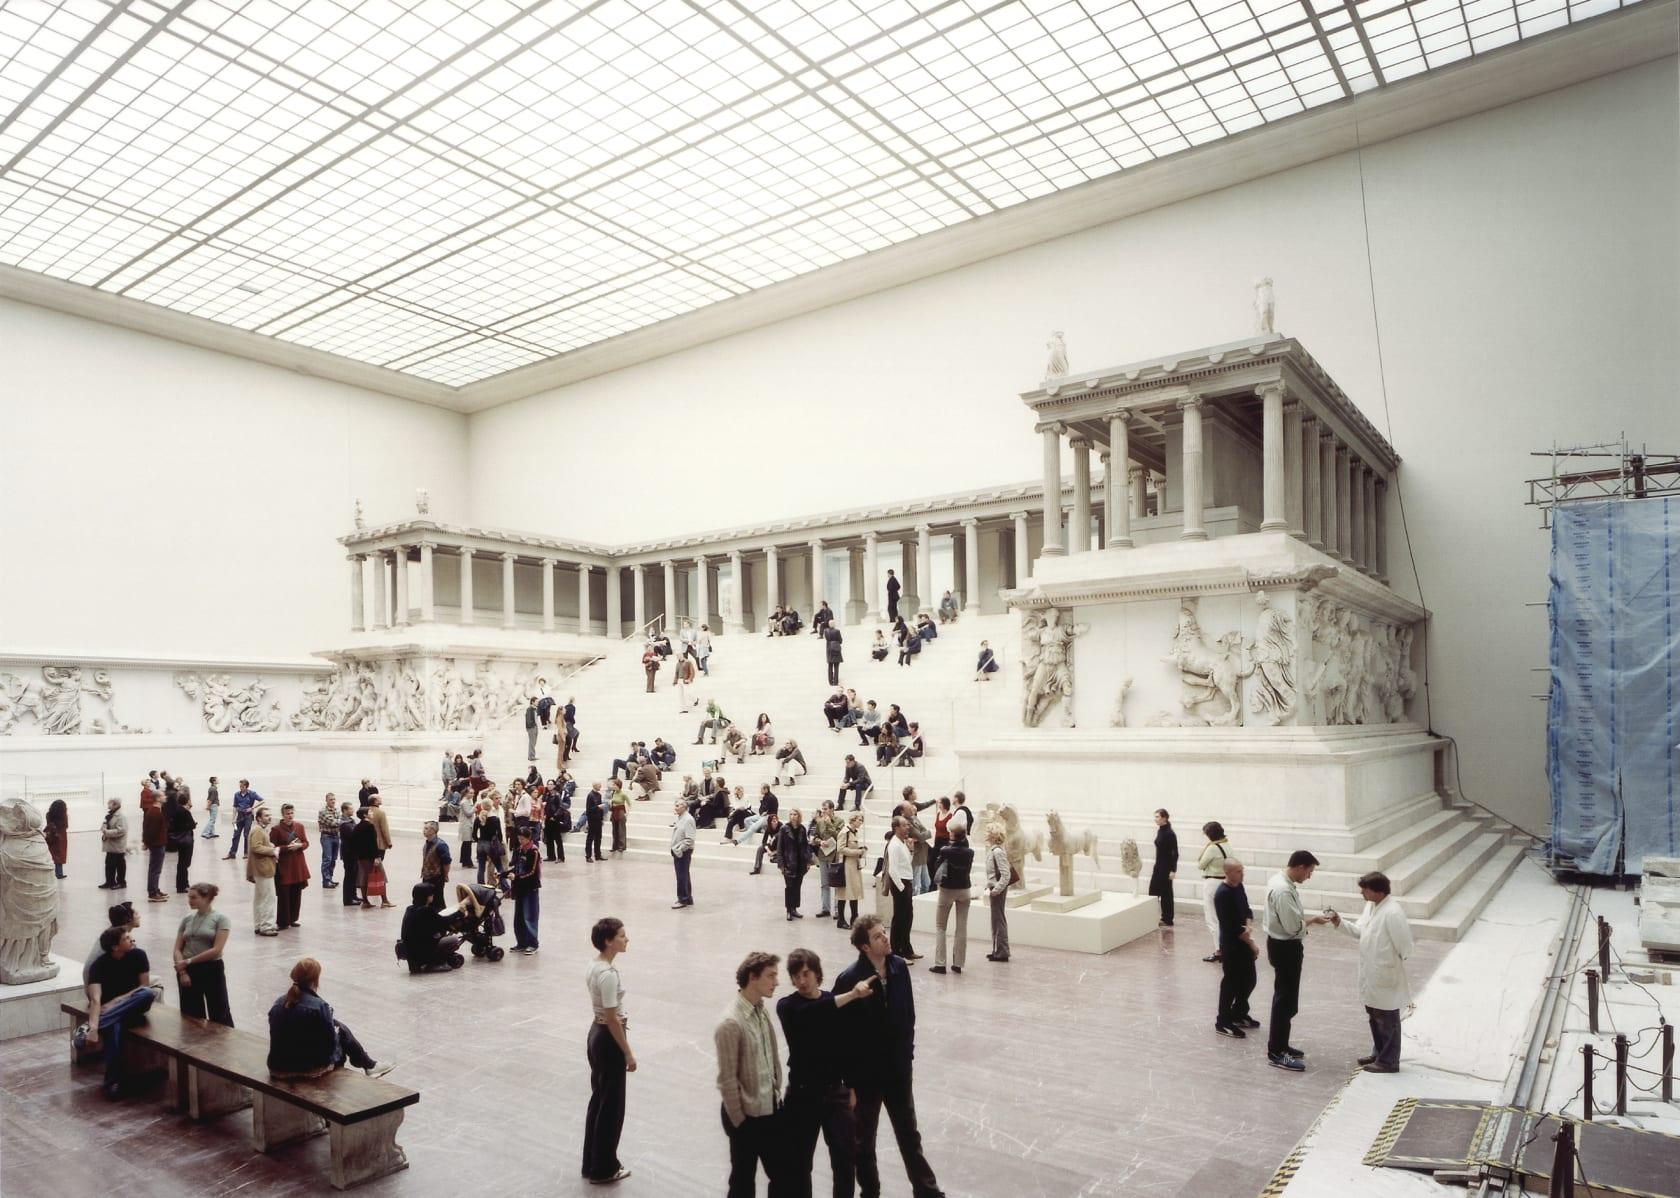 Thomas Struth Pergamon Museum I Berlin 2001 Marian Goodman